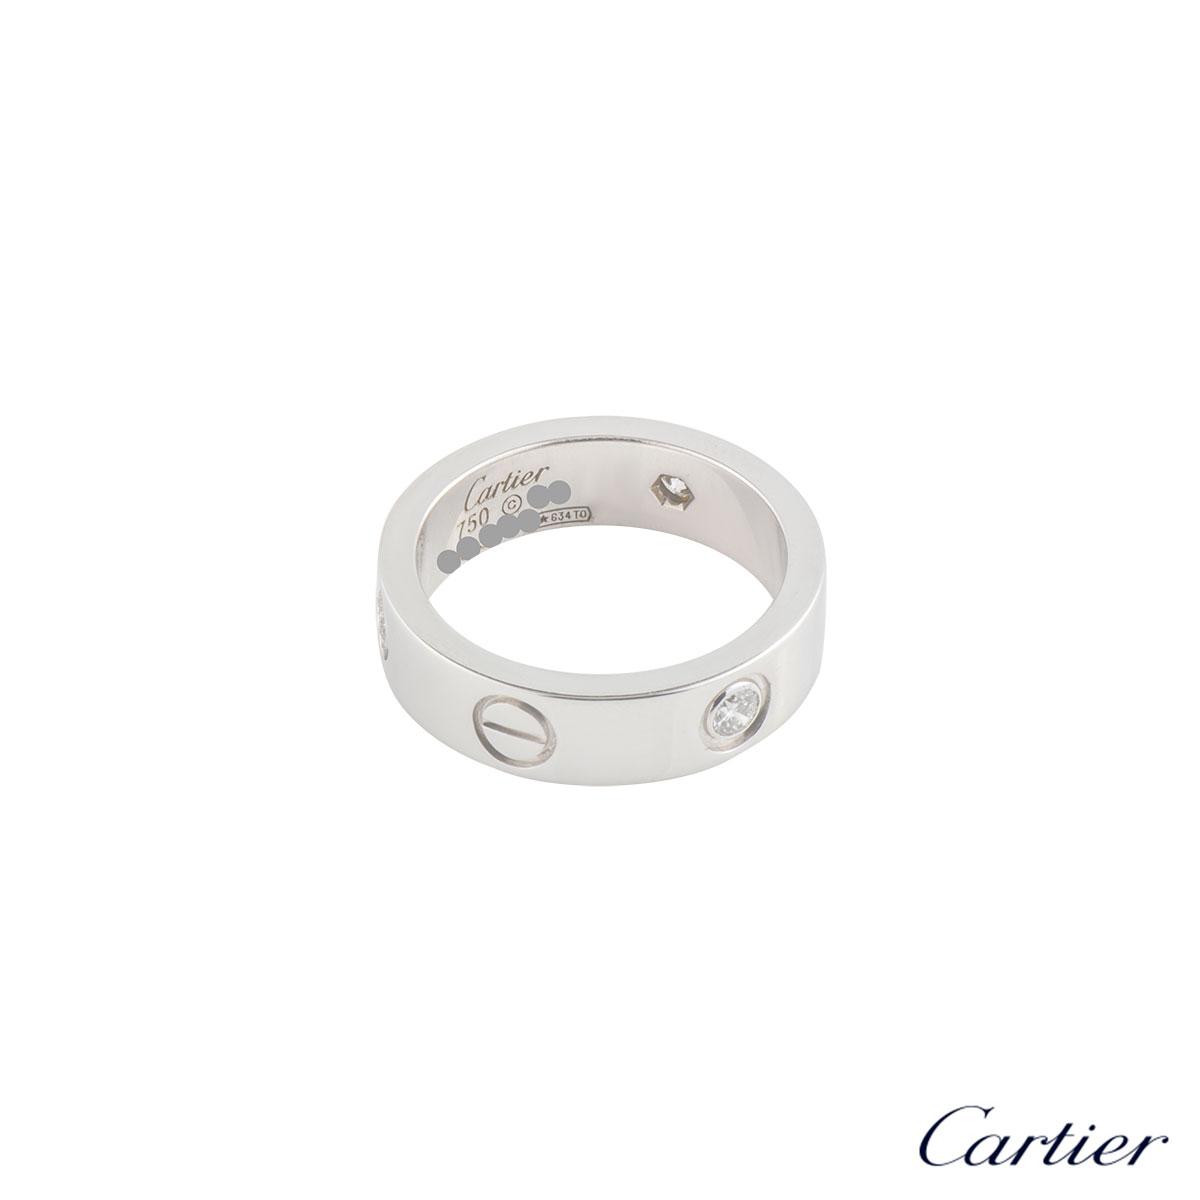 CartierWhite Gold Half Diamond Love Ring Size 53B4032553